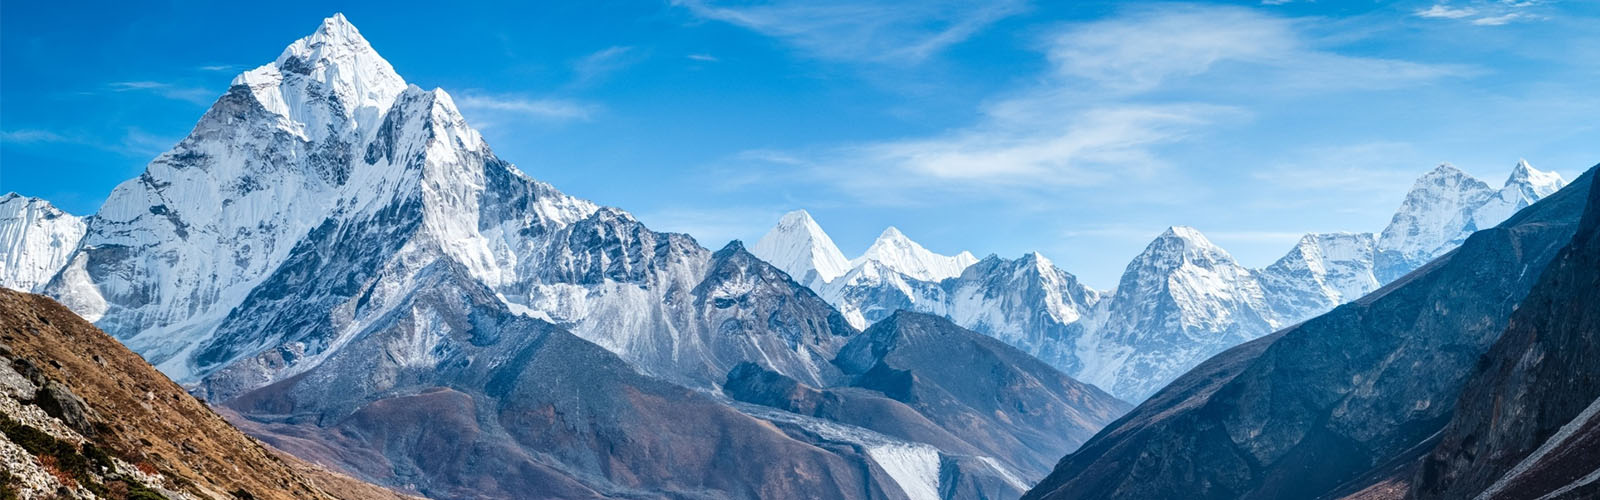 12345678 Natural Mountain Climbing Resources of India 印度的天然登山資源(上)